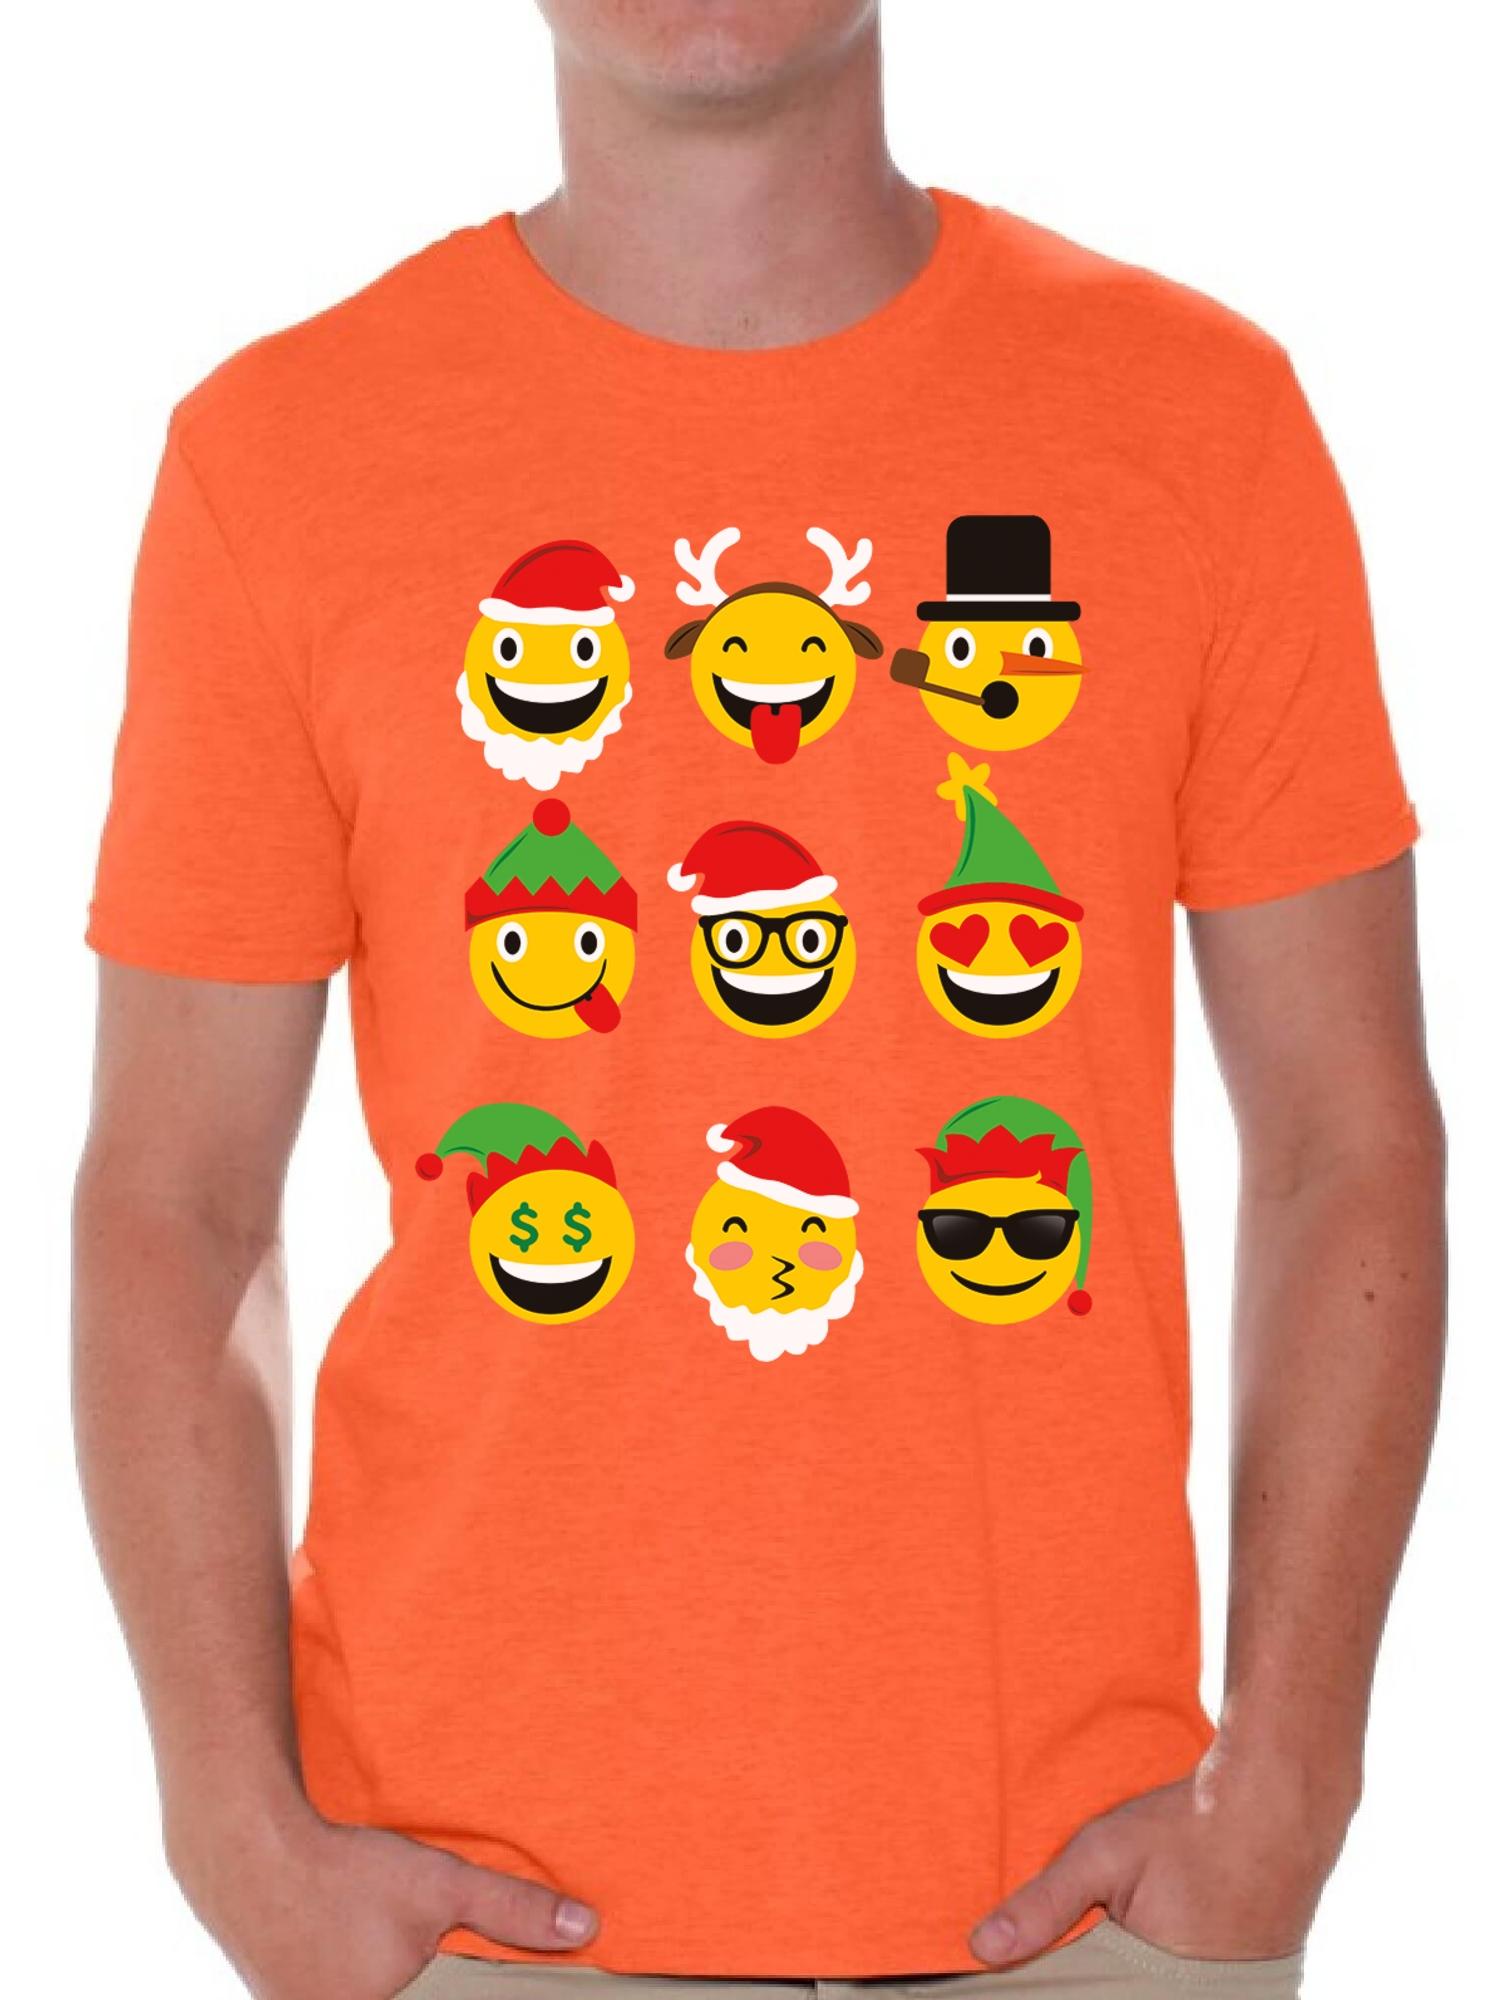 Kids Poo Emoji T-shirt Funny Emoticon Movie Cute Website Social Media Gift Top